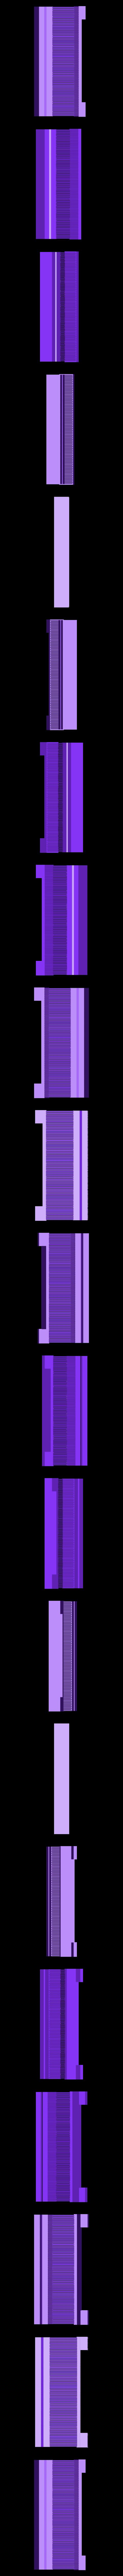 EUMAKEIT_brush_UAUproject_brush.stl Download free STL file Brushy - Keyboard brush • 3D printable model, EUMAKERS